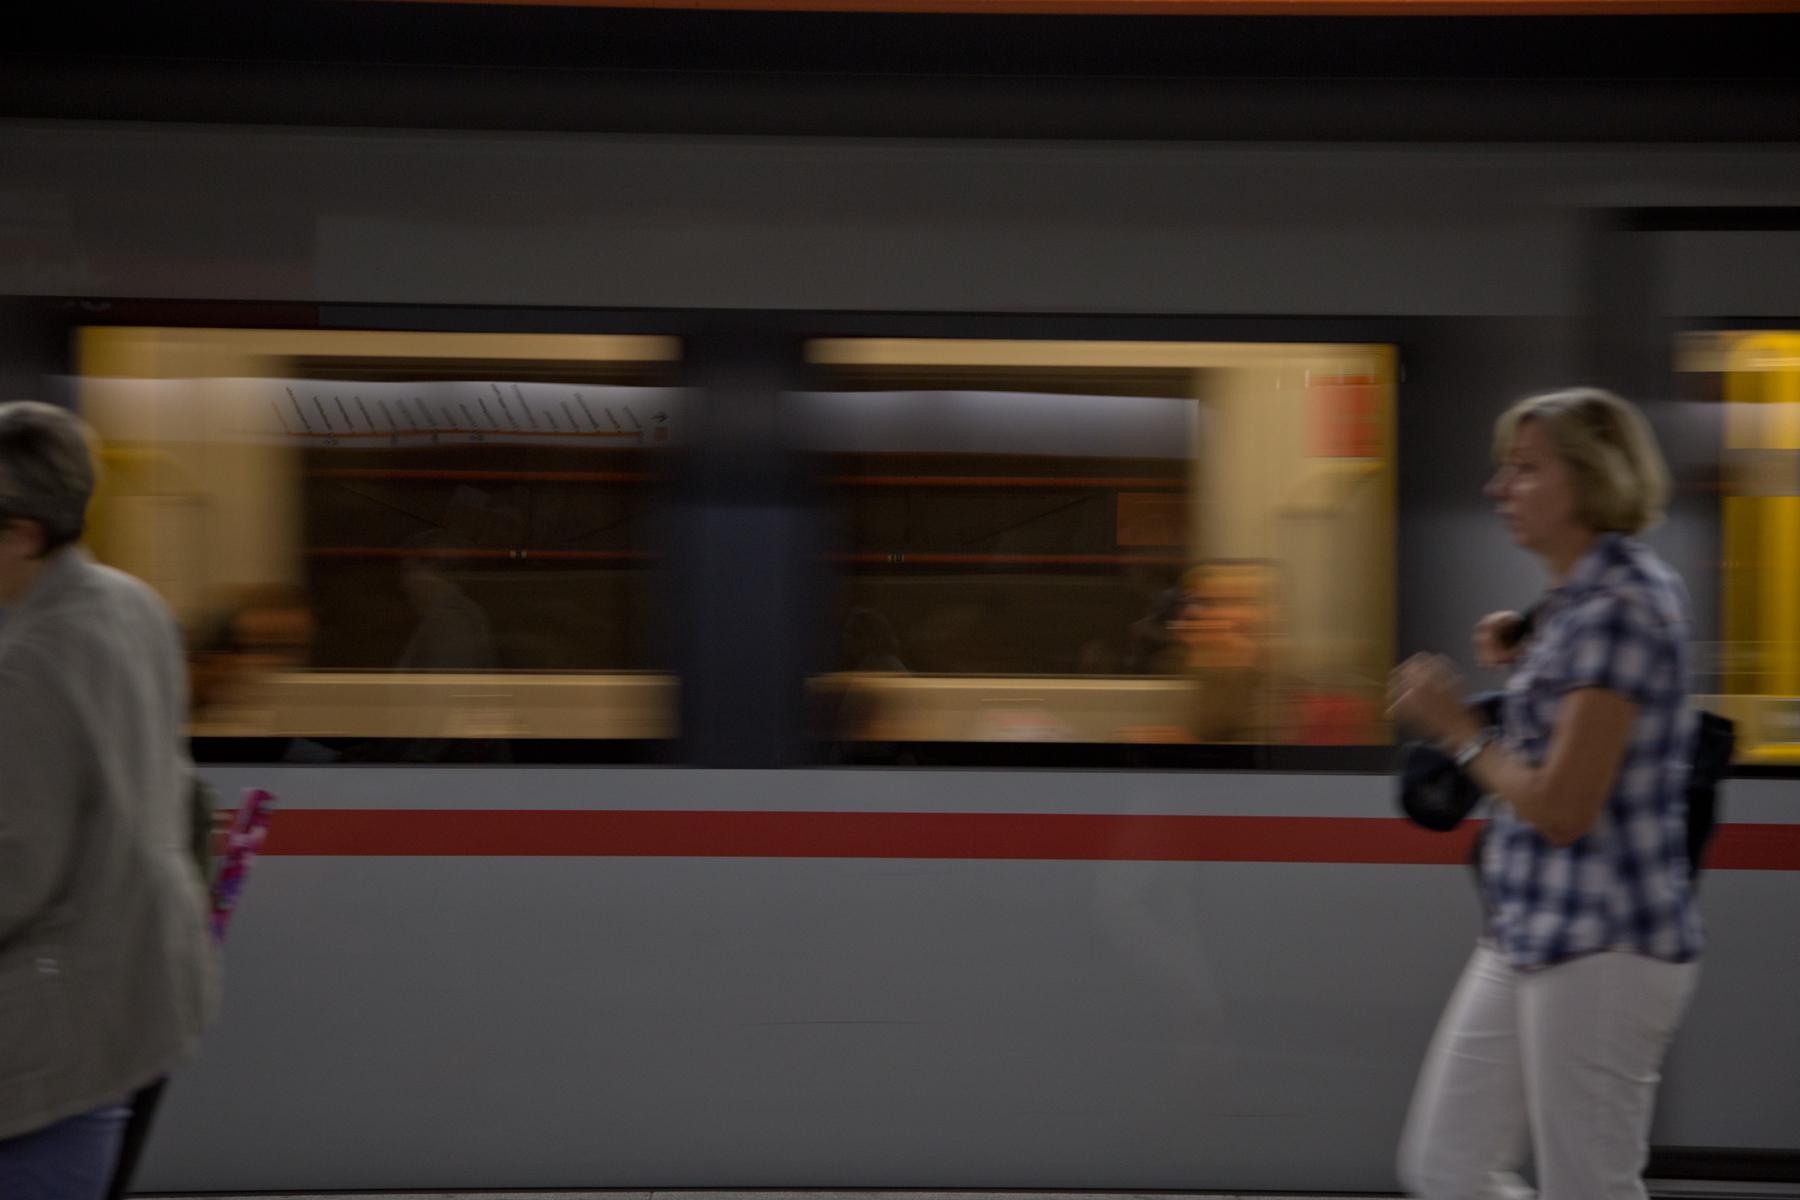 U-Bahn-U3